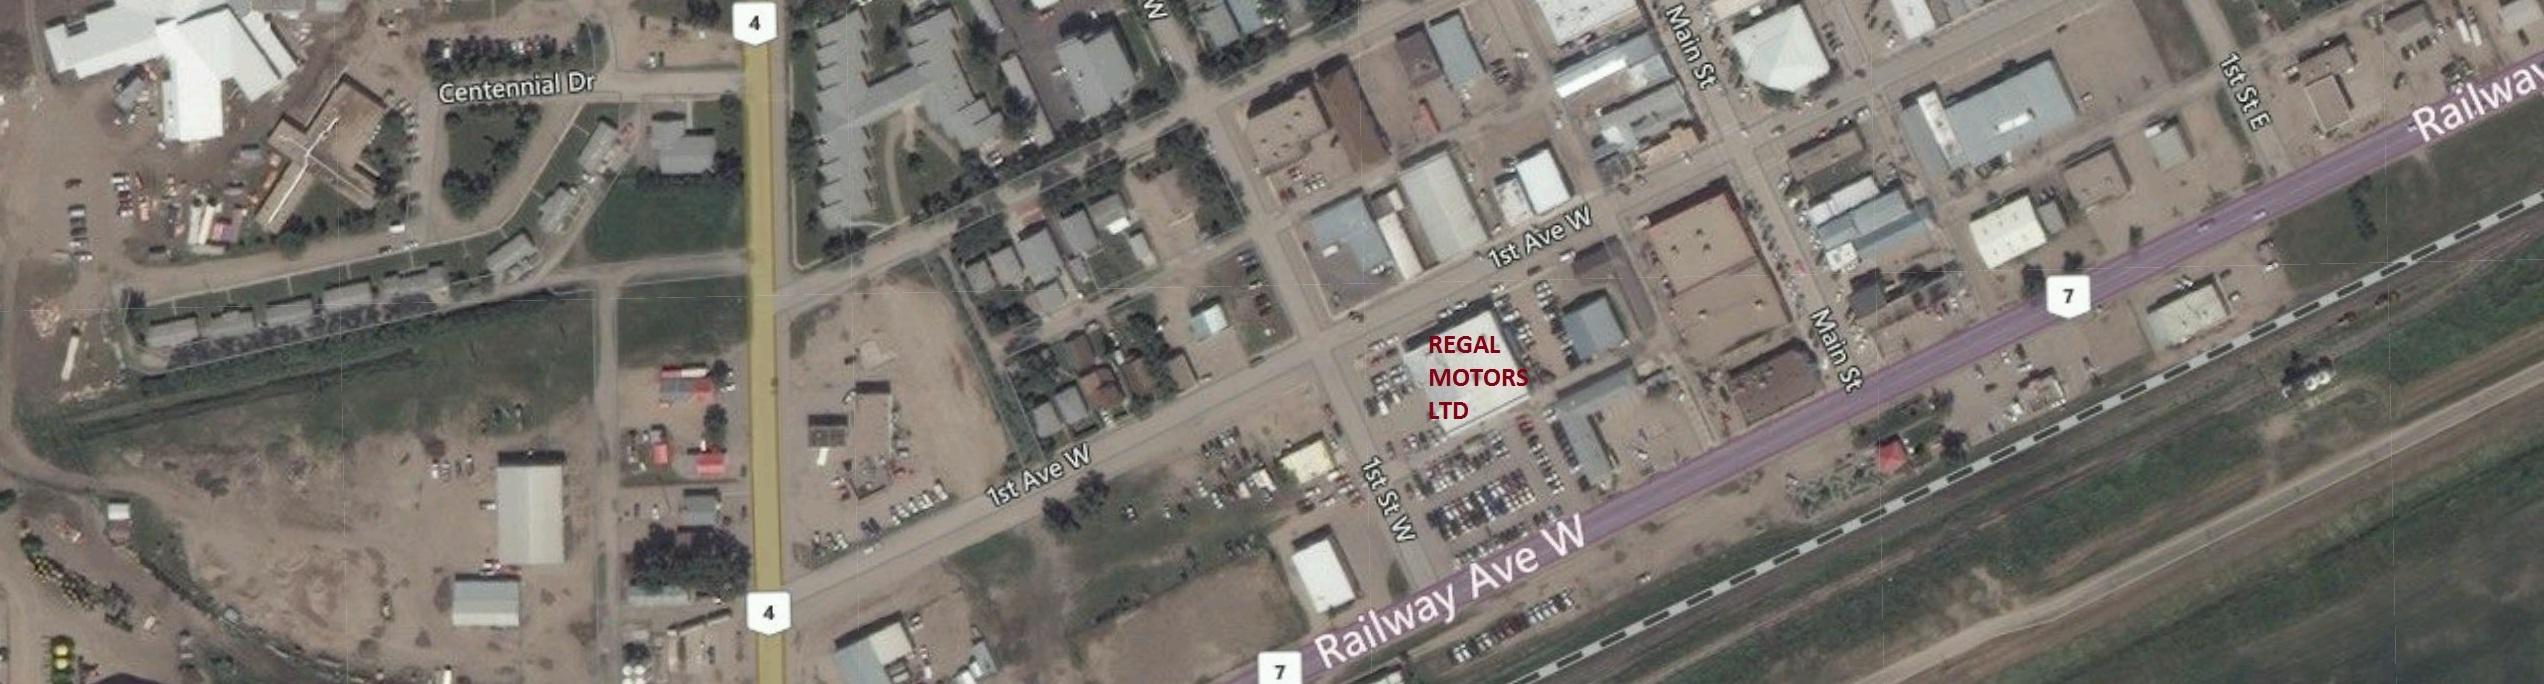 Google Map Directions to Regal Motors in Rosetown SK